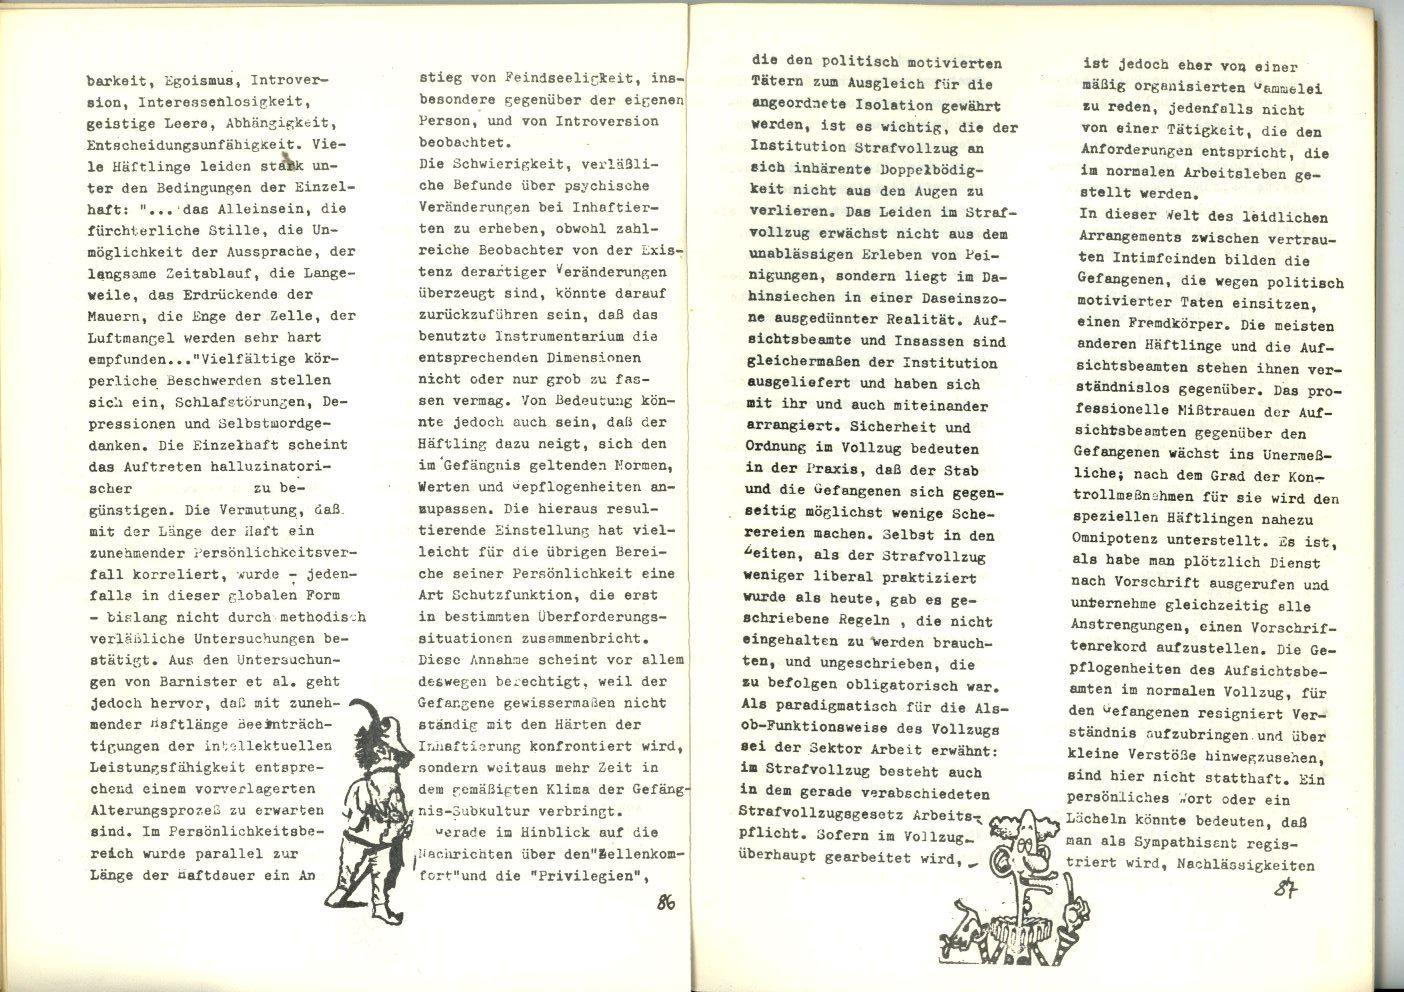 Marburg_Russell_Initiative_1978_45